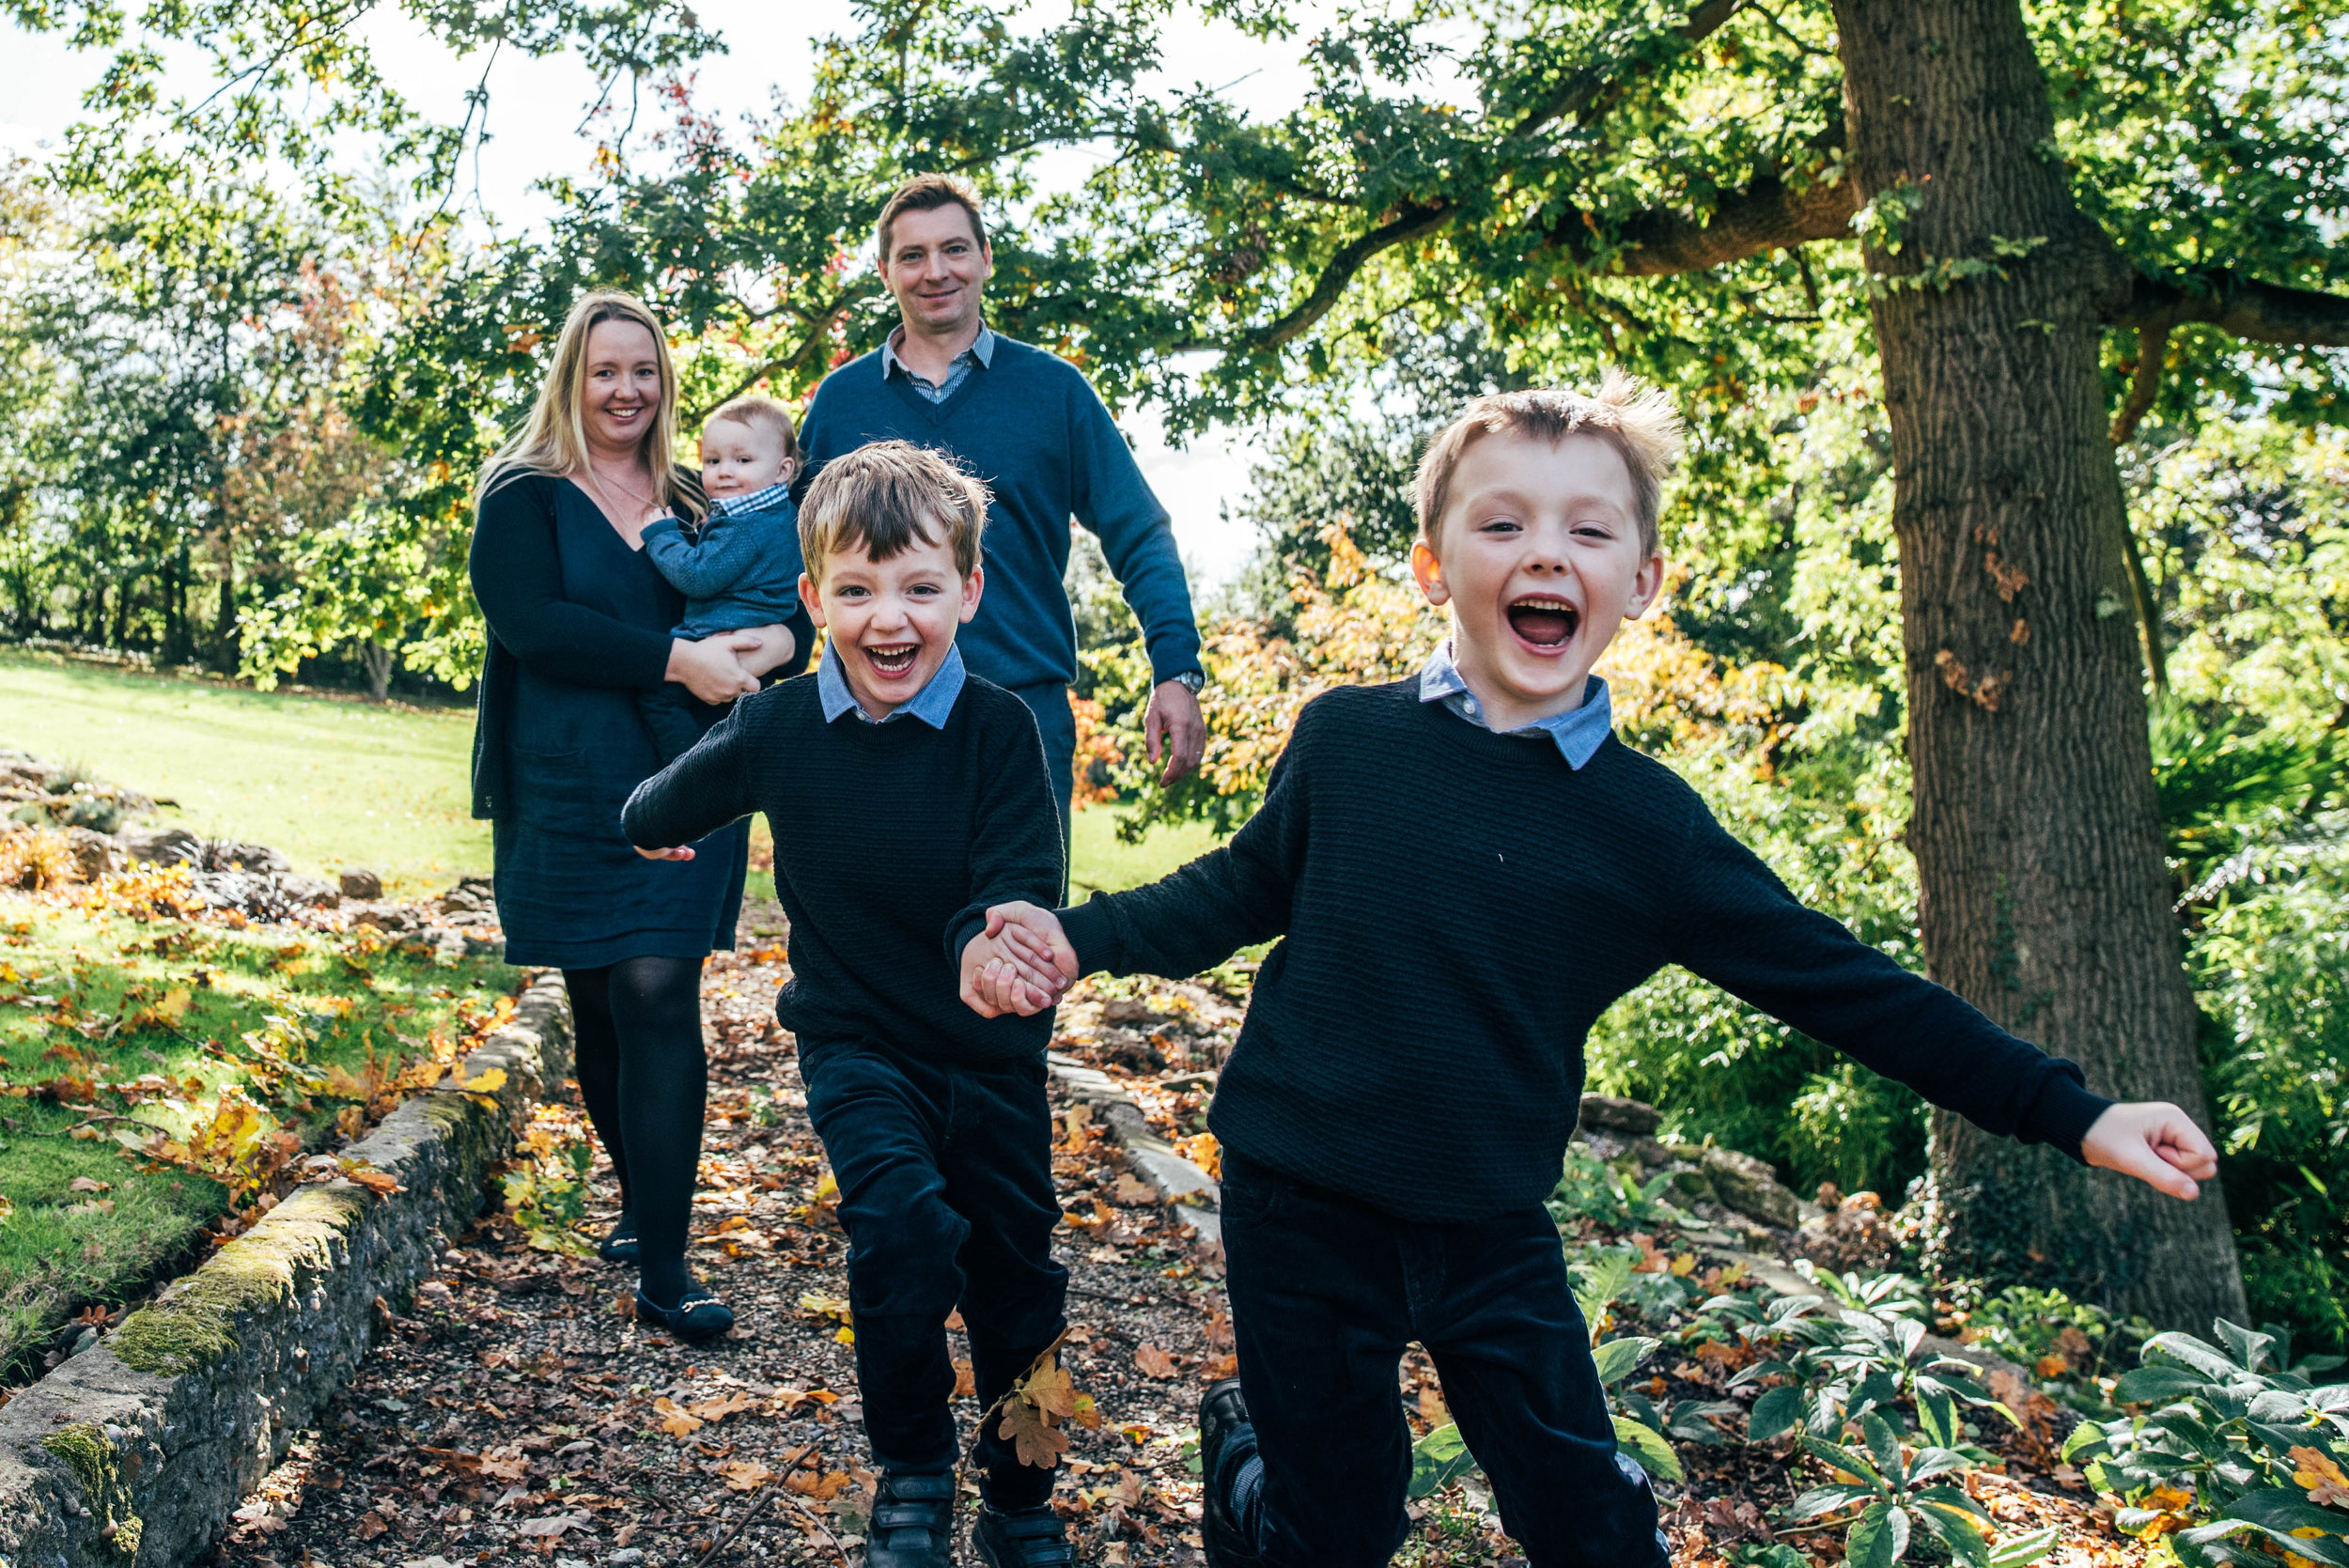 Boys run towards camera in garden Essex Documentary Portrait Photographer